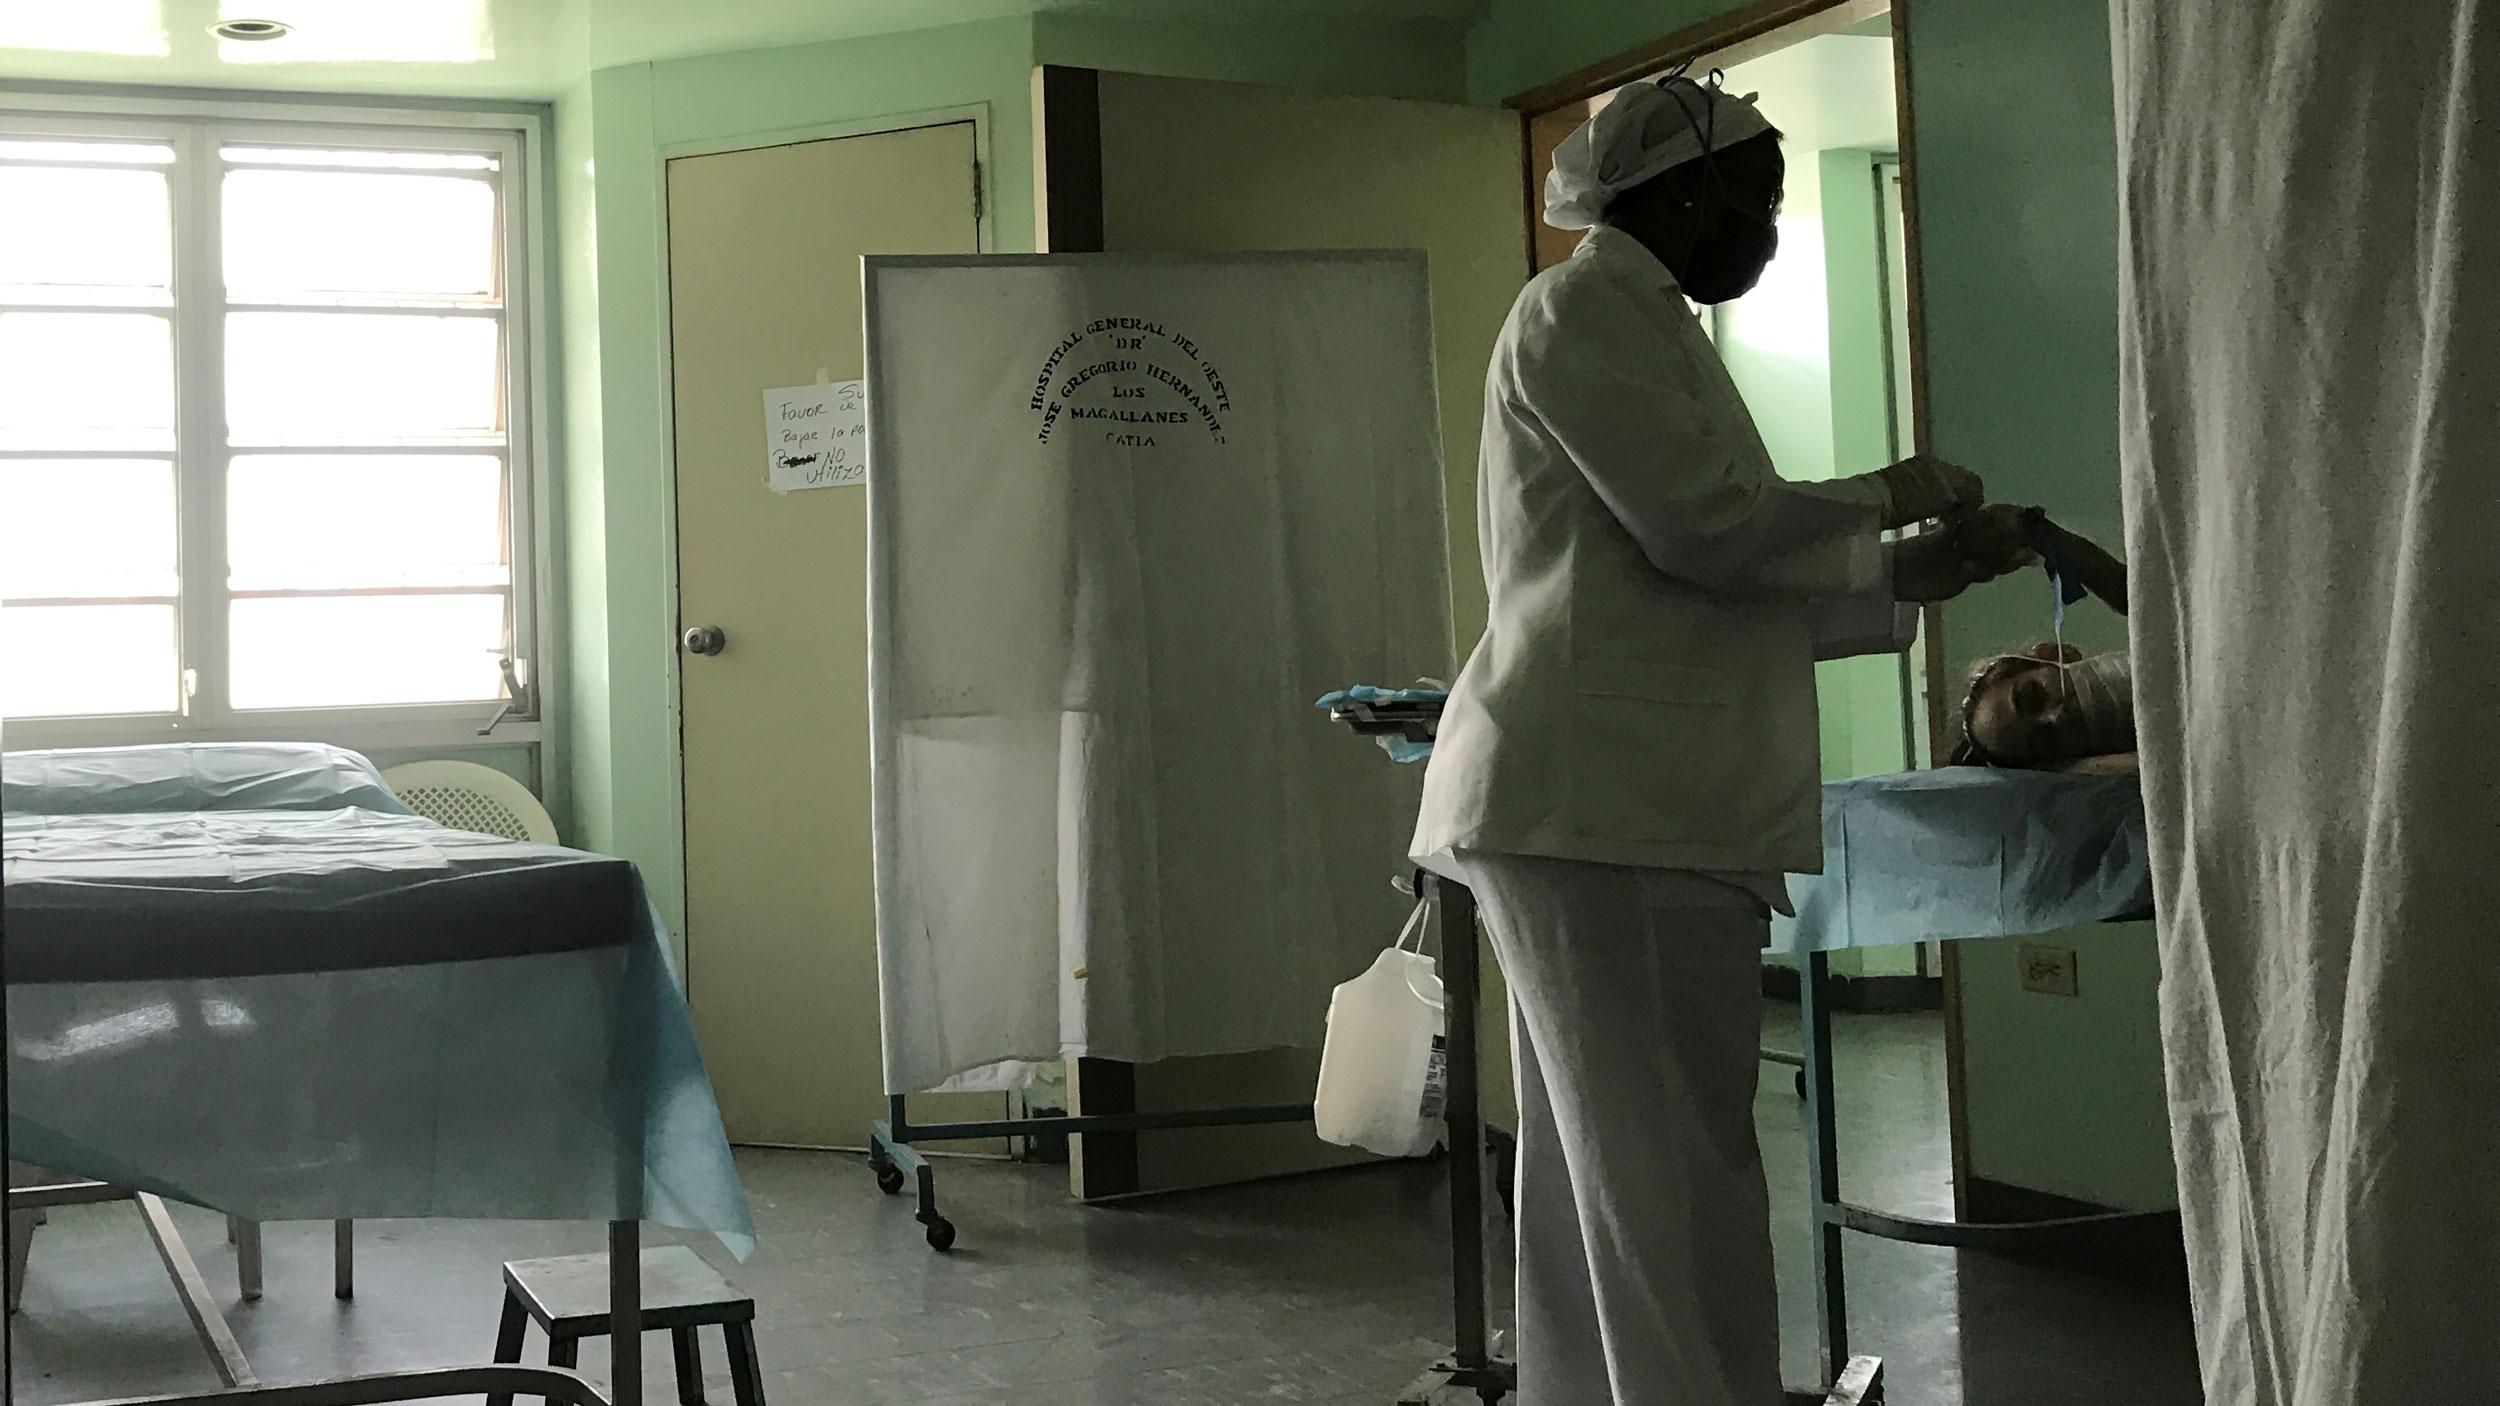 A nurse treats a TB patient on a hospital bed